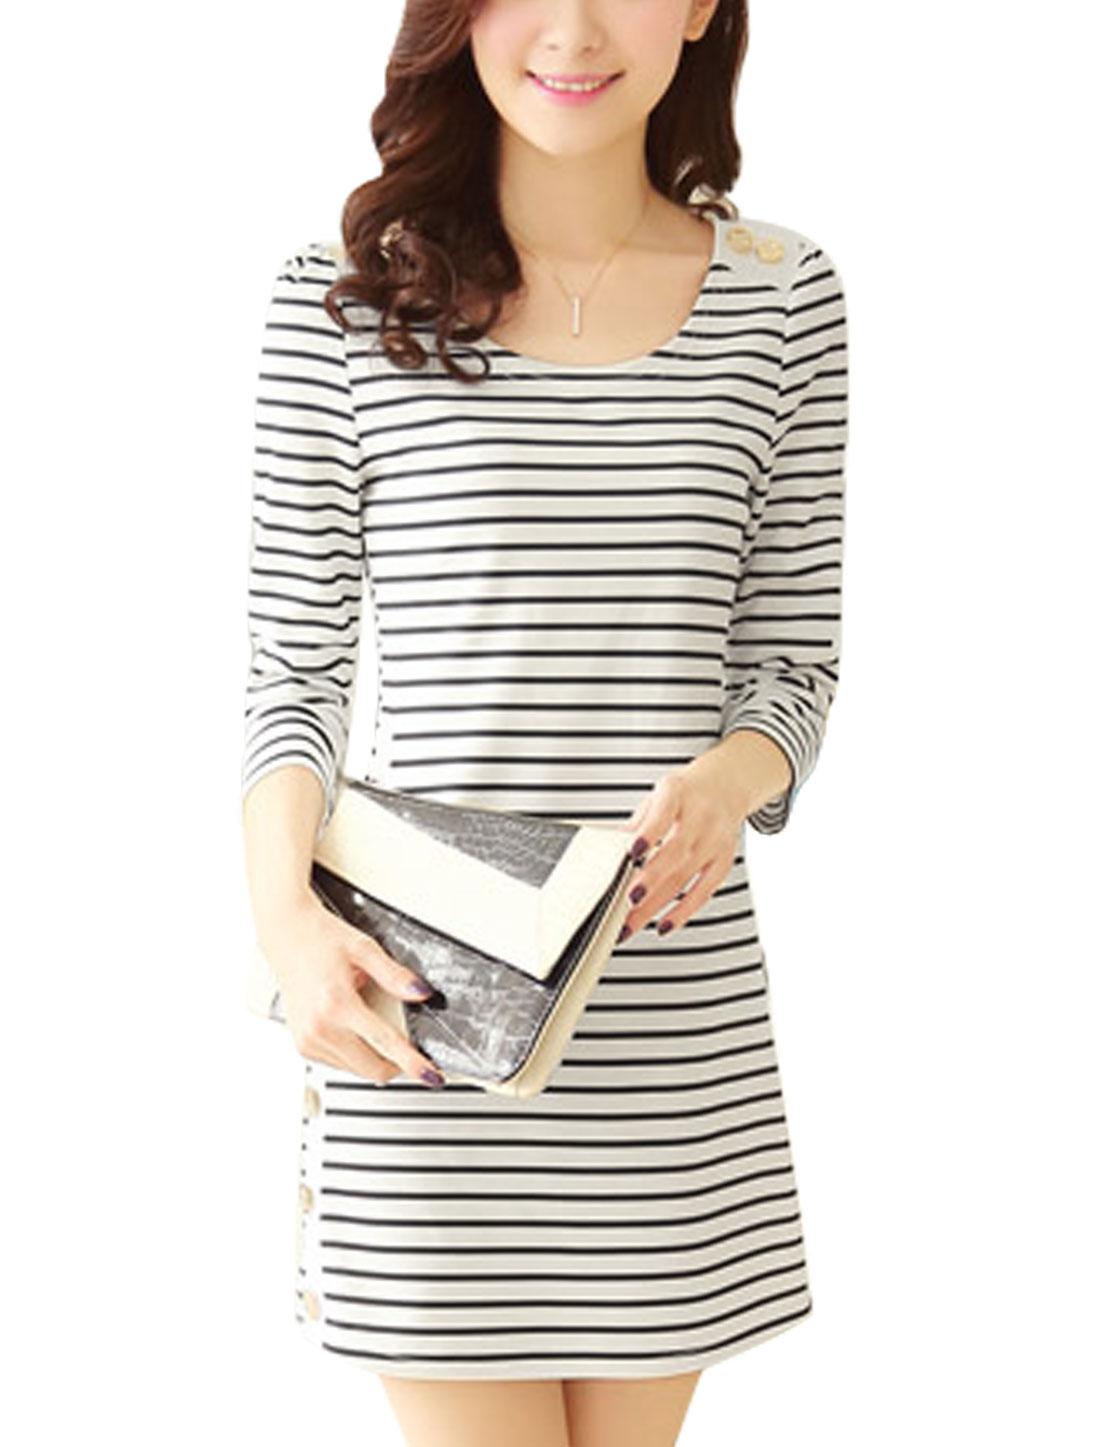 Allegra K Woman Stripes Button Embellished Round Neck Pullover Shift Dress White M